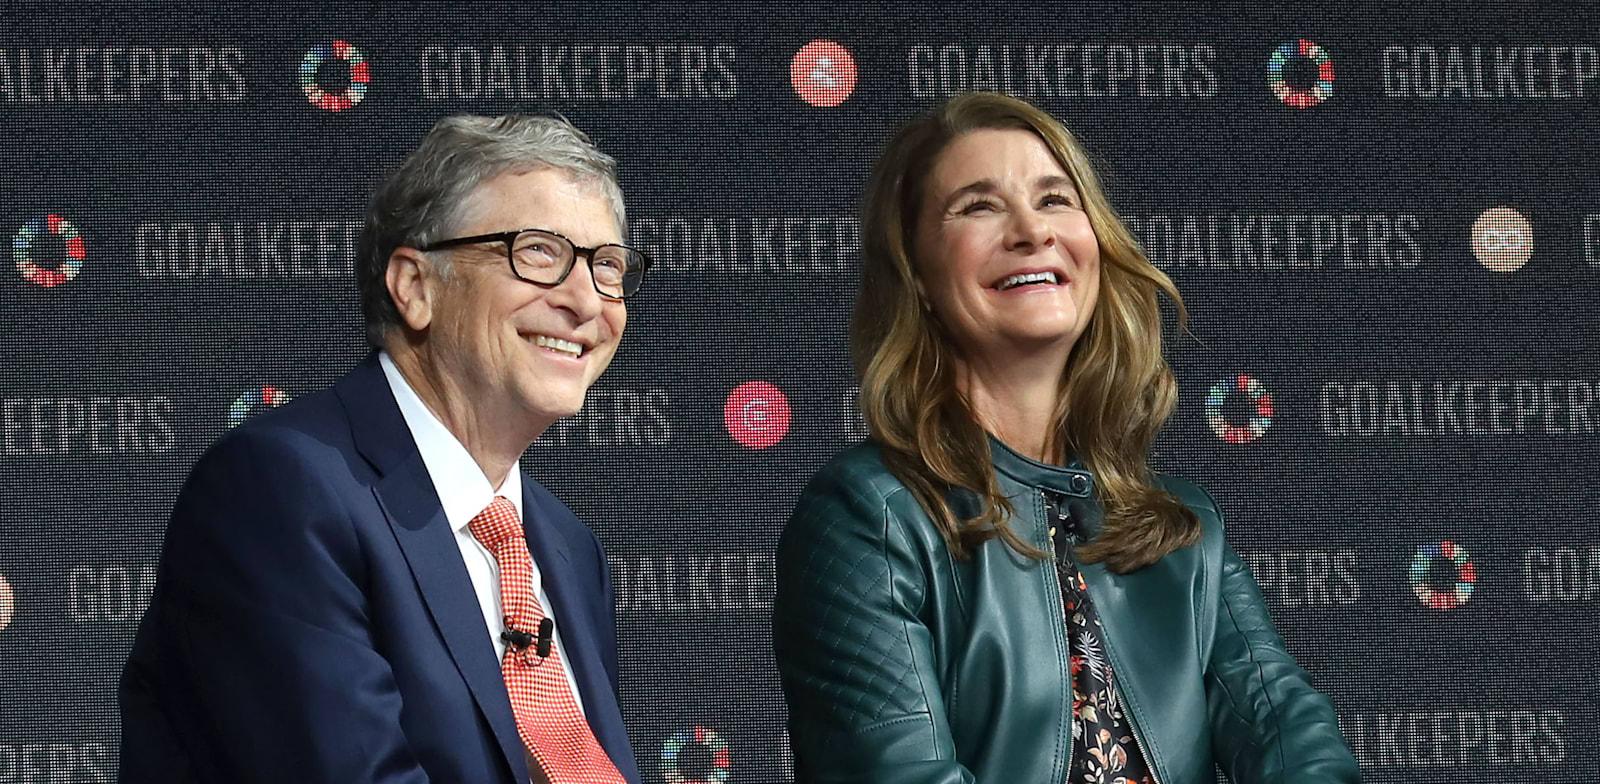 ביל ומלינדה גייטס / צילום: Reuters, PBG